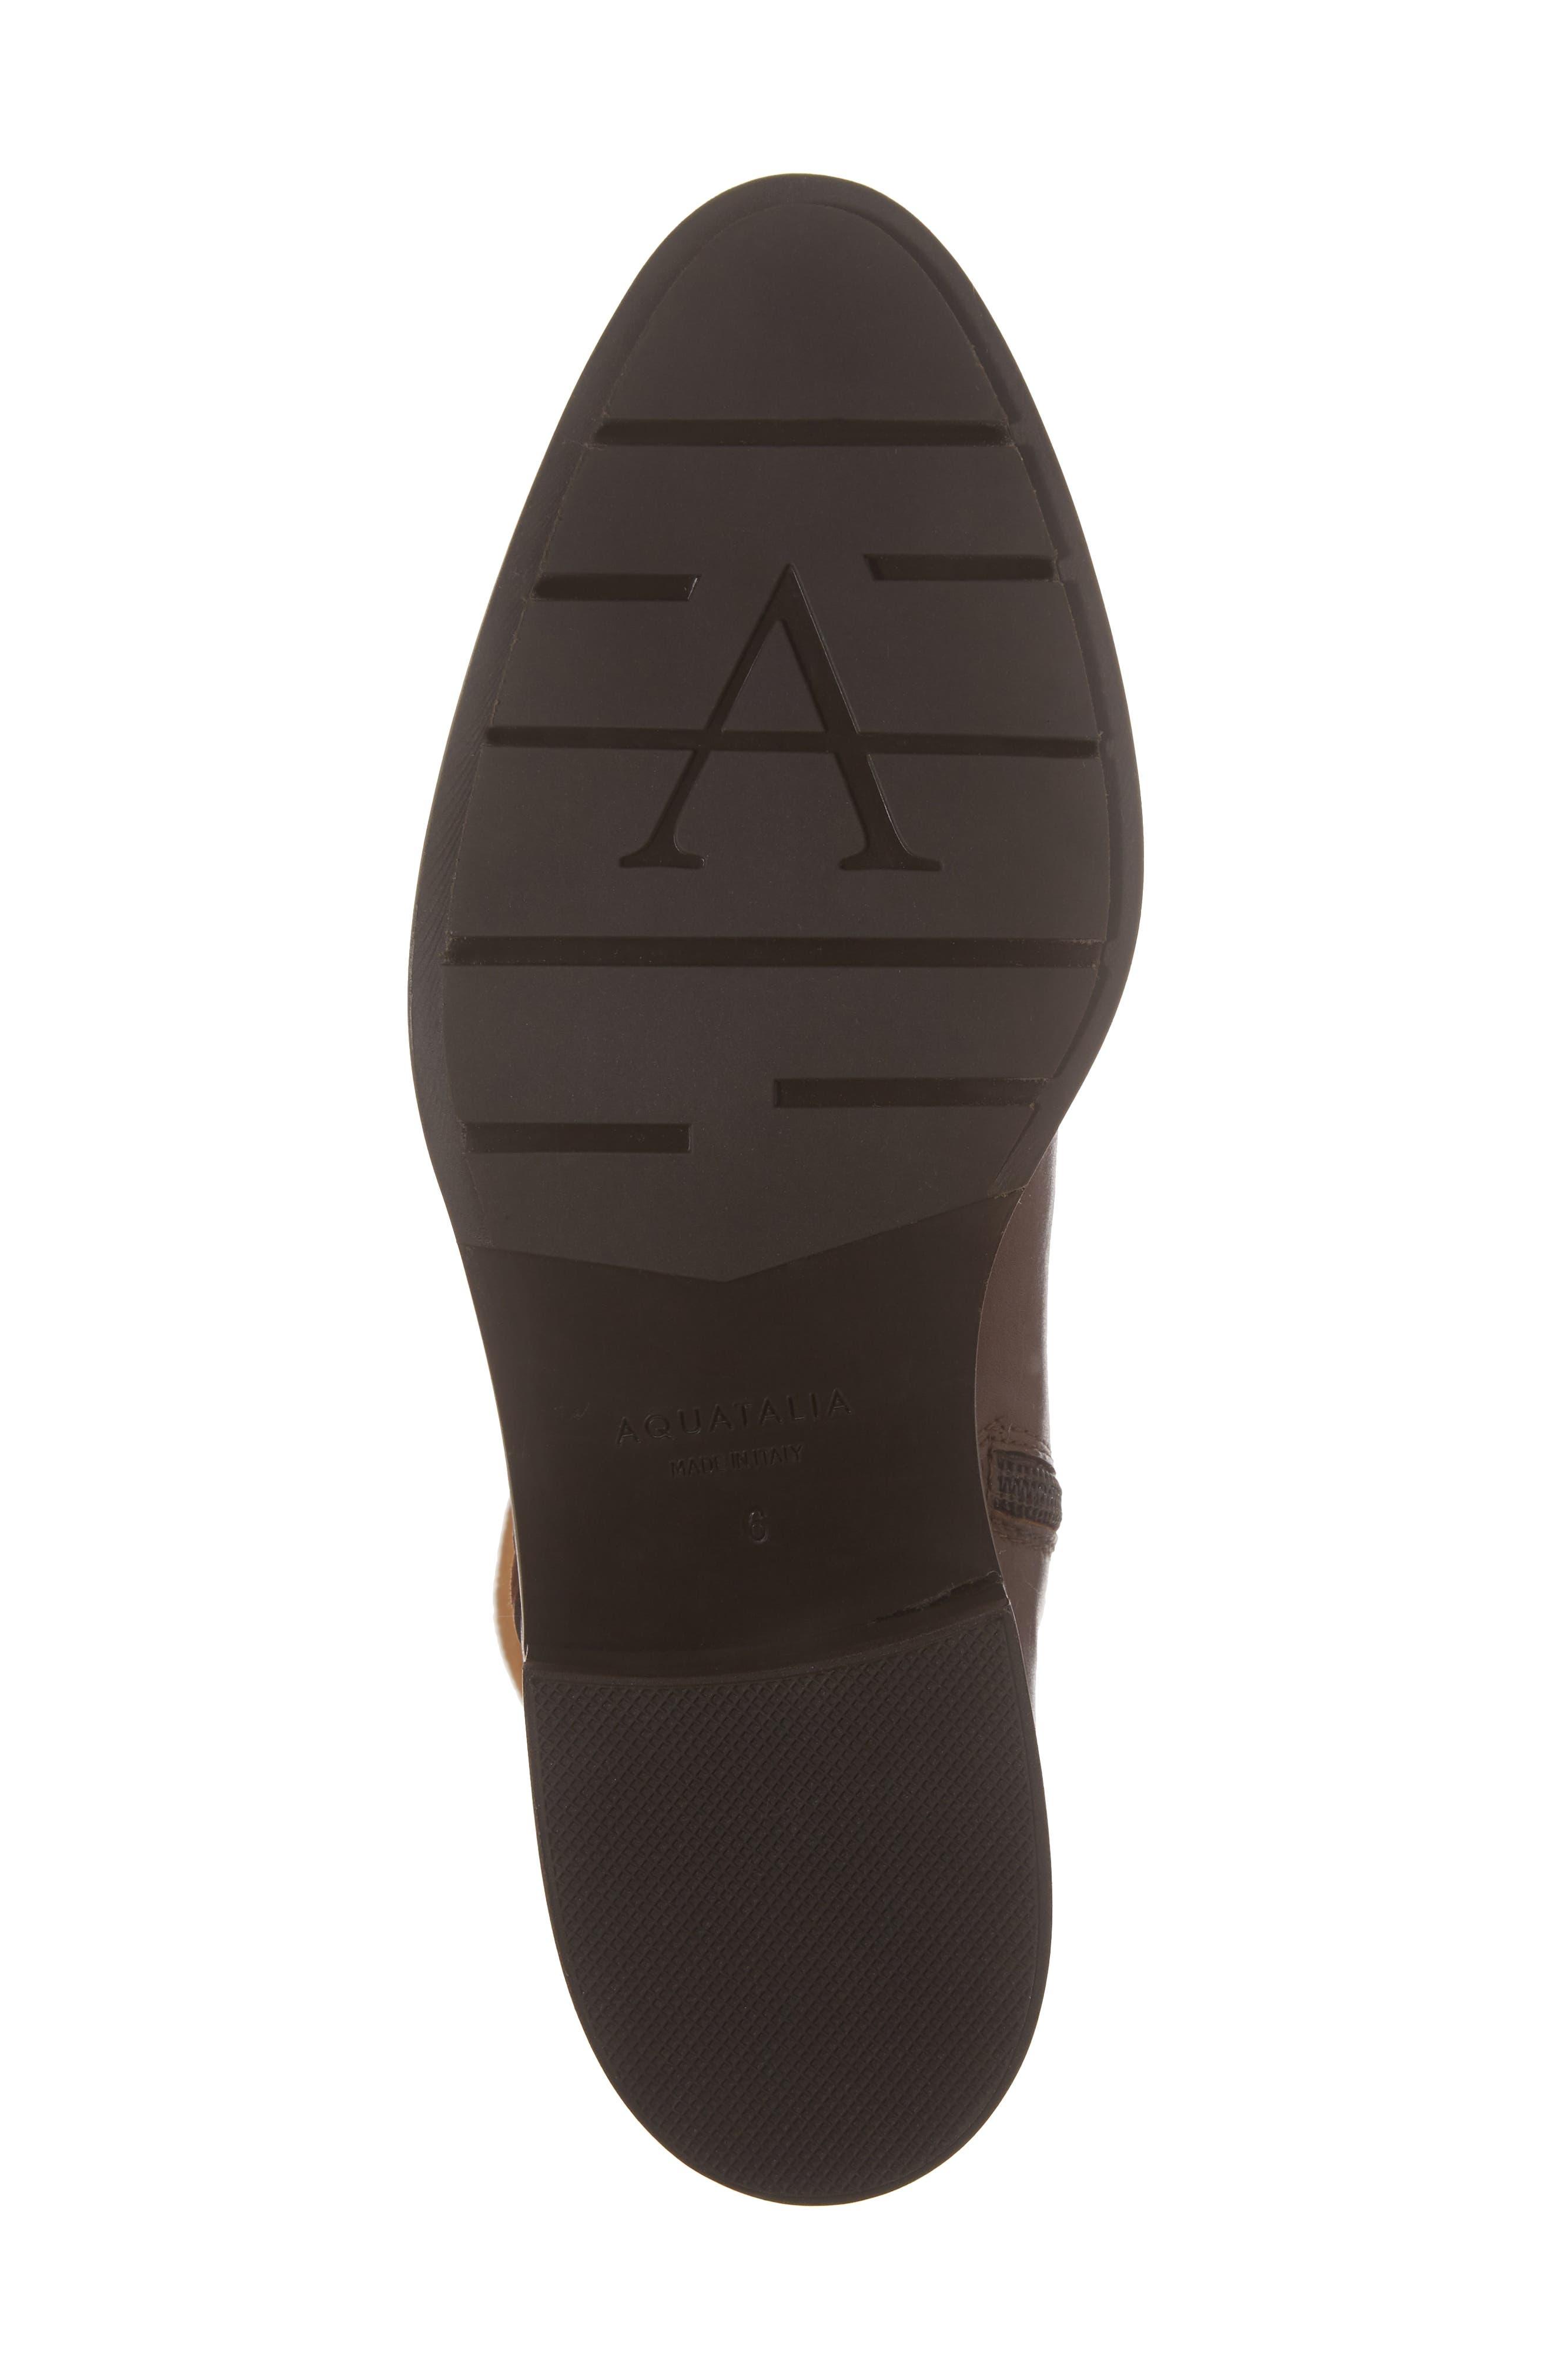 Nicolette Weatherproof Knee High Boot,                             Alternate thumbnail 6, color,                             Castagno Calf/ Elastic